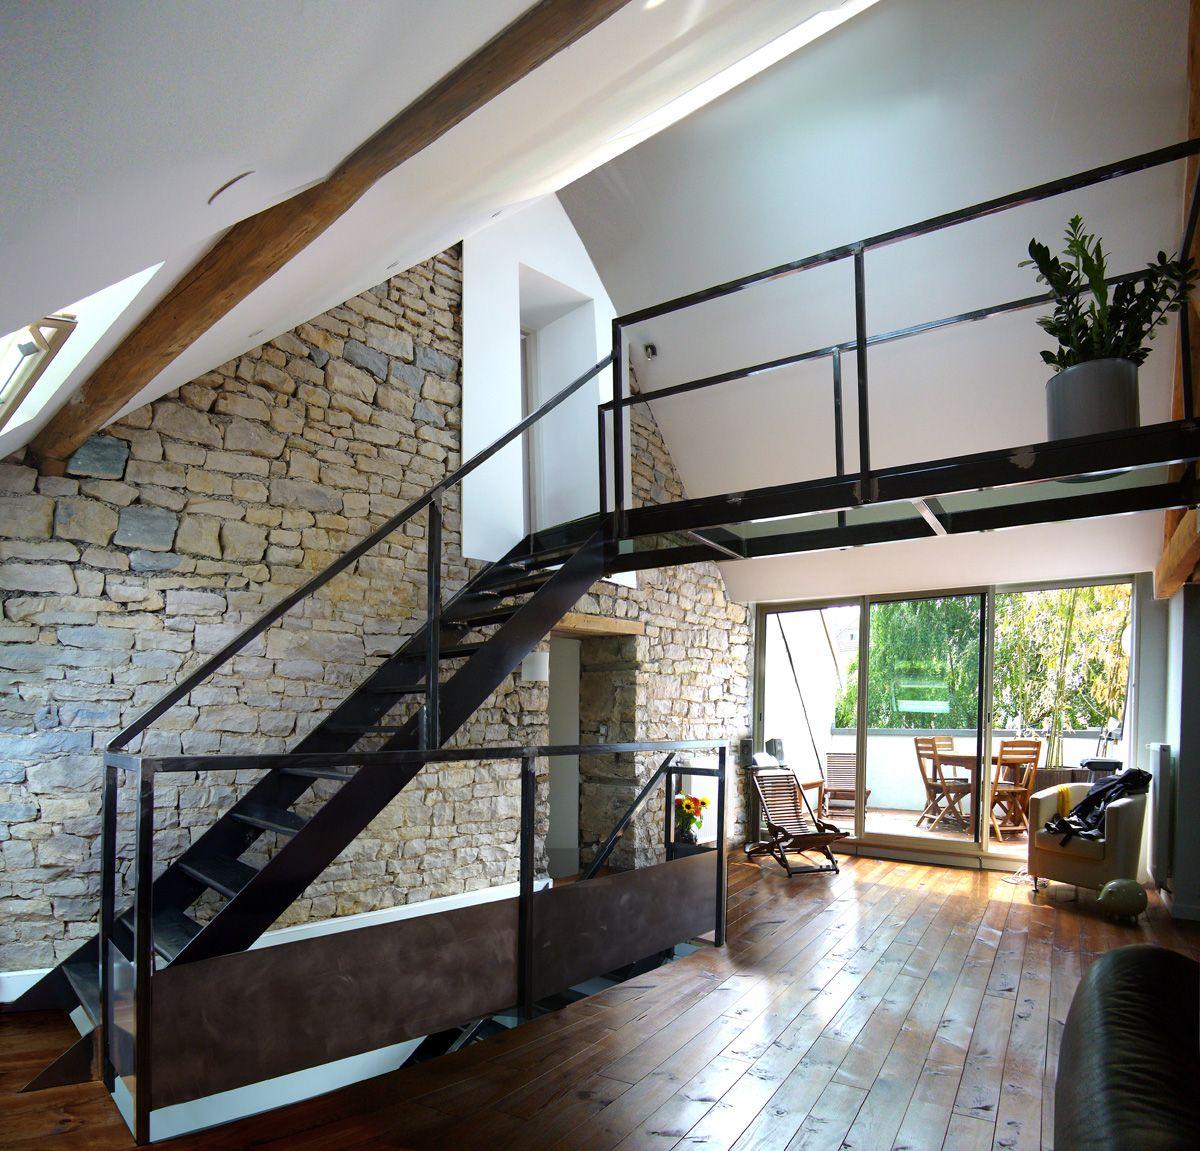 r novation grange am nagement loft divercity entreprise g nerale de batiment lyon 69. Black Bedroom Furniture Sets. Home Design Ideas